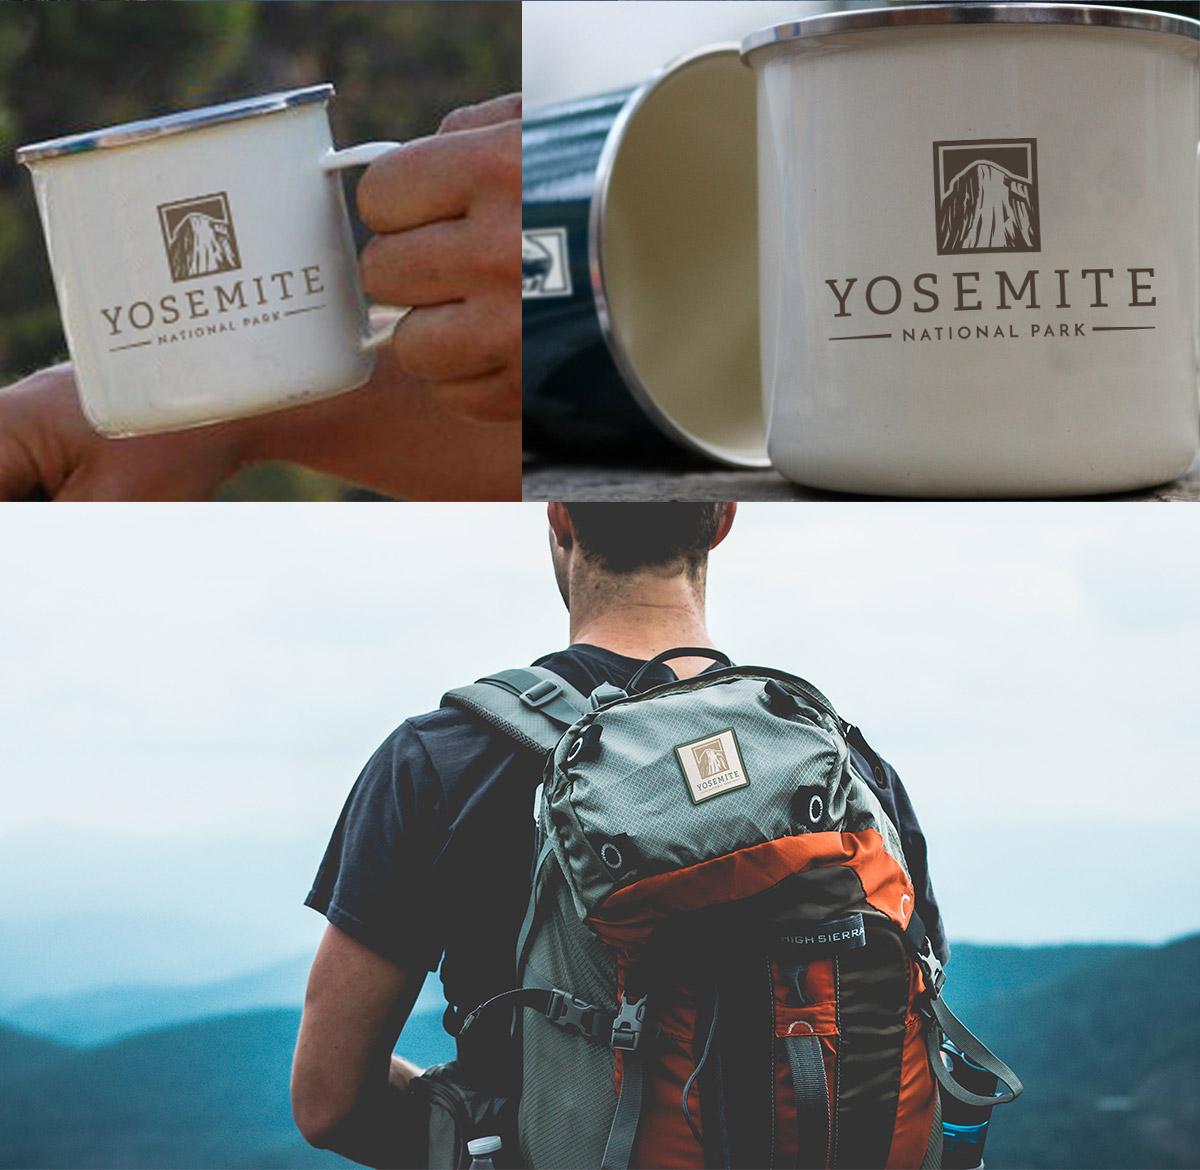 YosemiteBlogPost_05